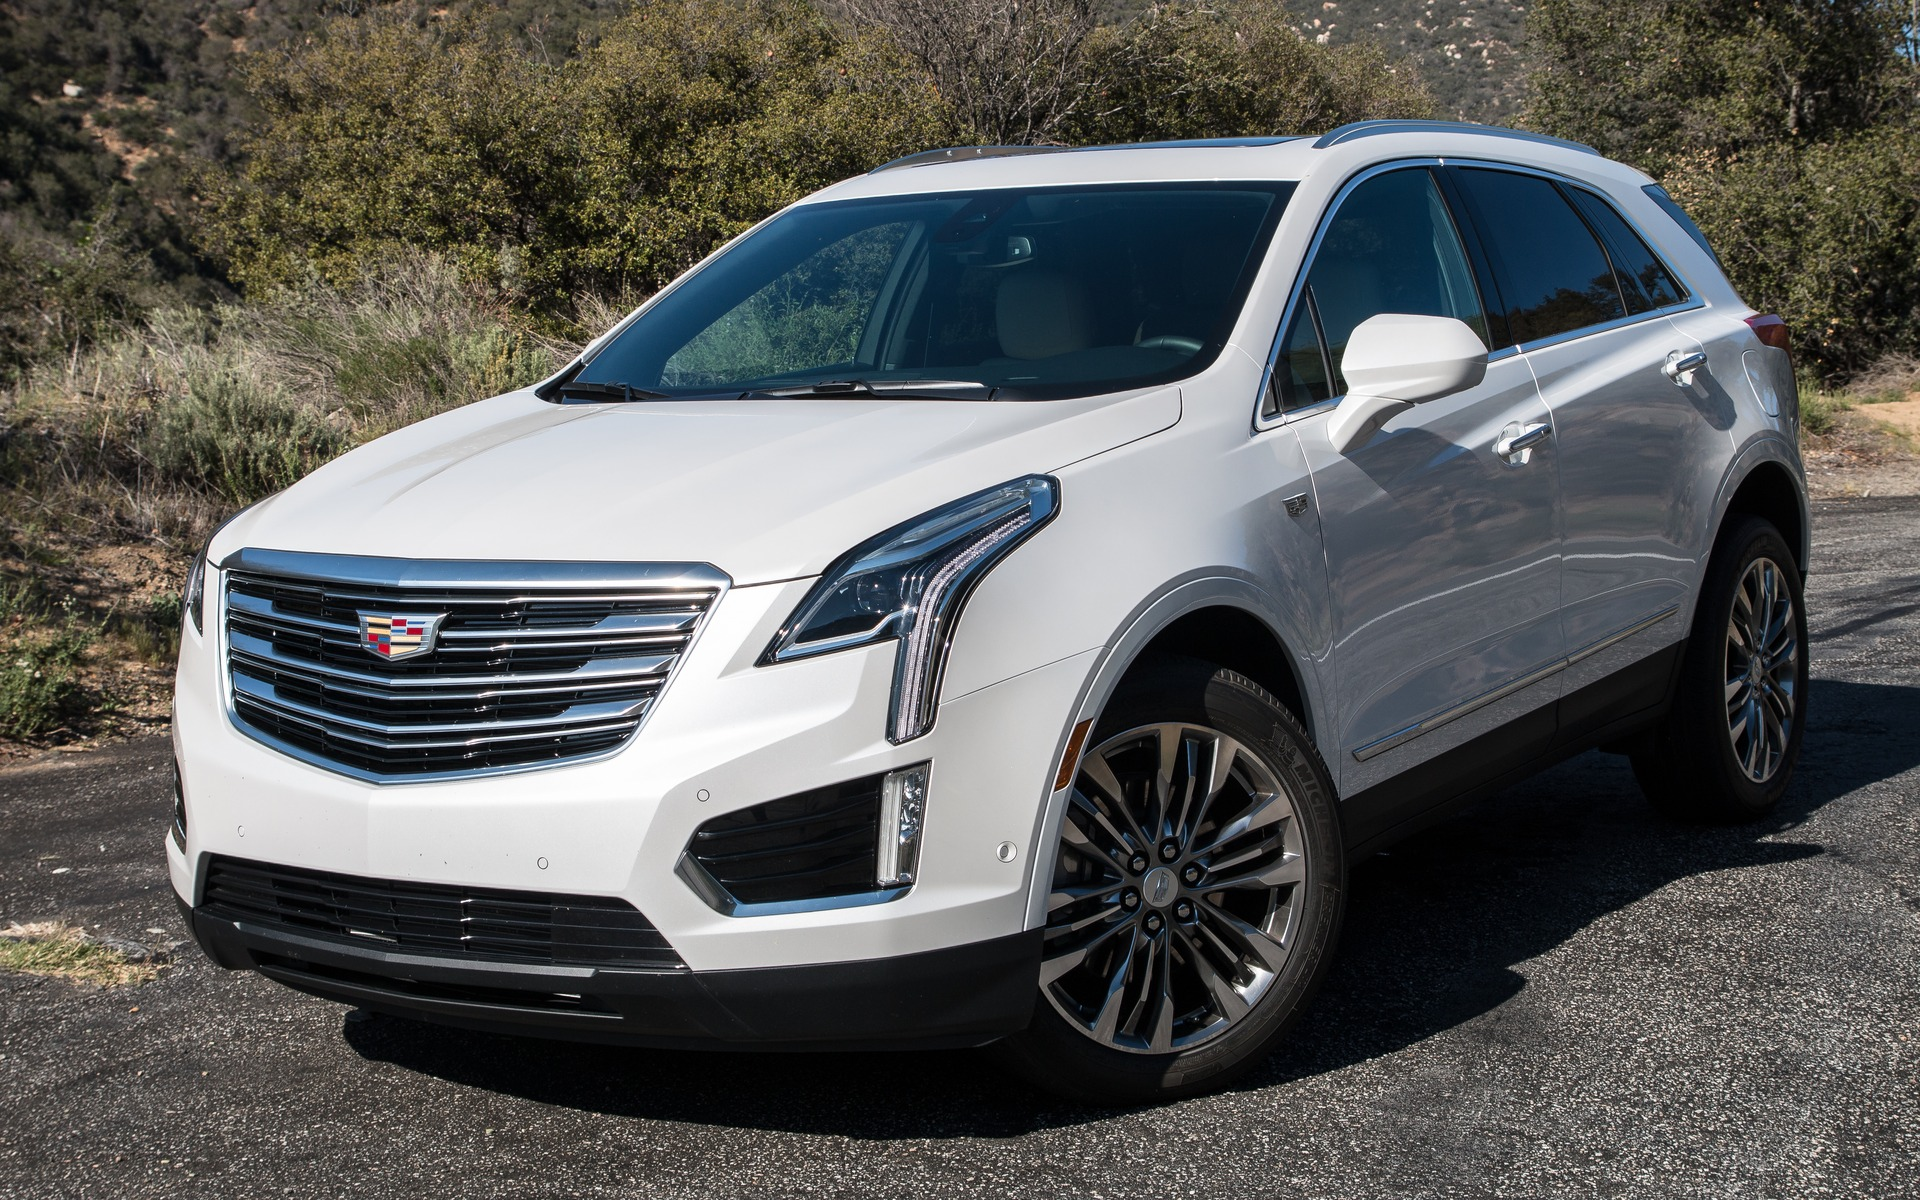 2017 Xt5 Cadillac >> Photos Cadillac XT5 2017 - 12/56 - Guide Auto